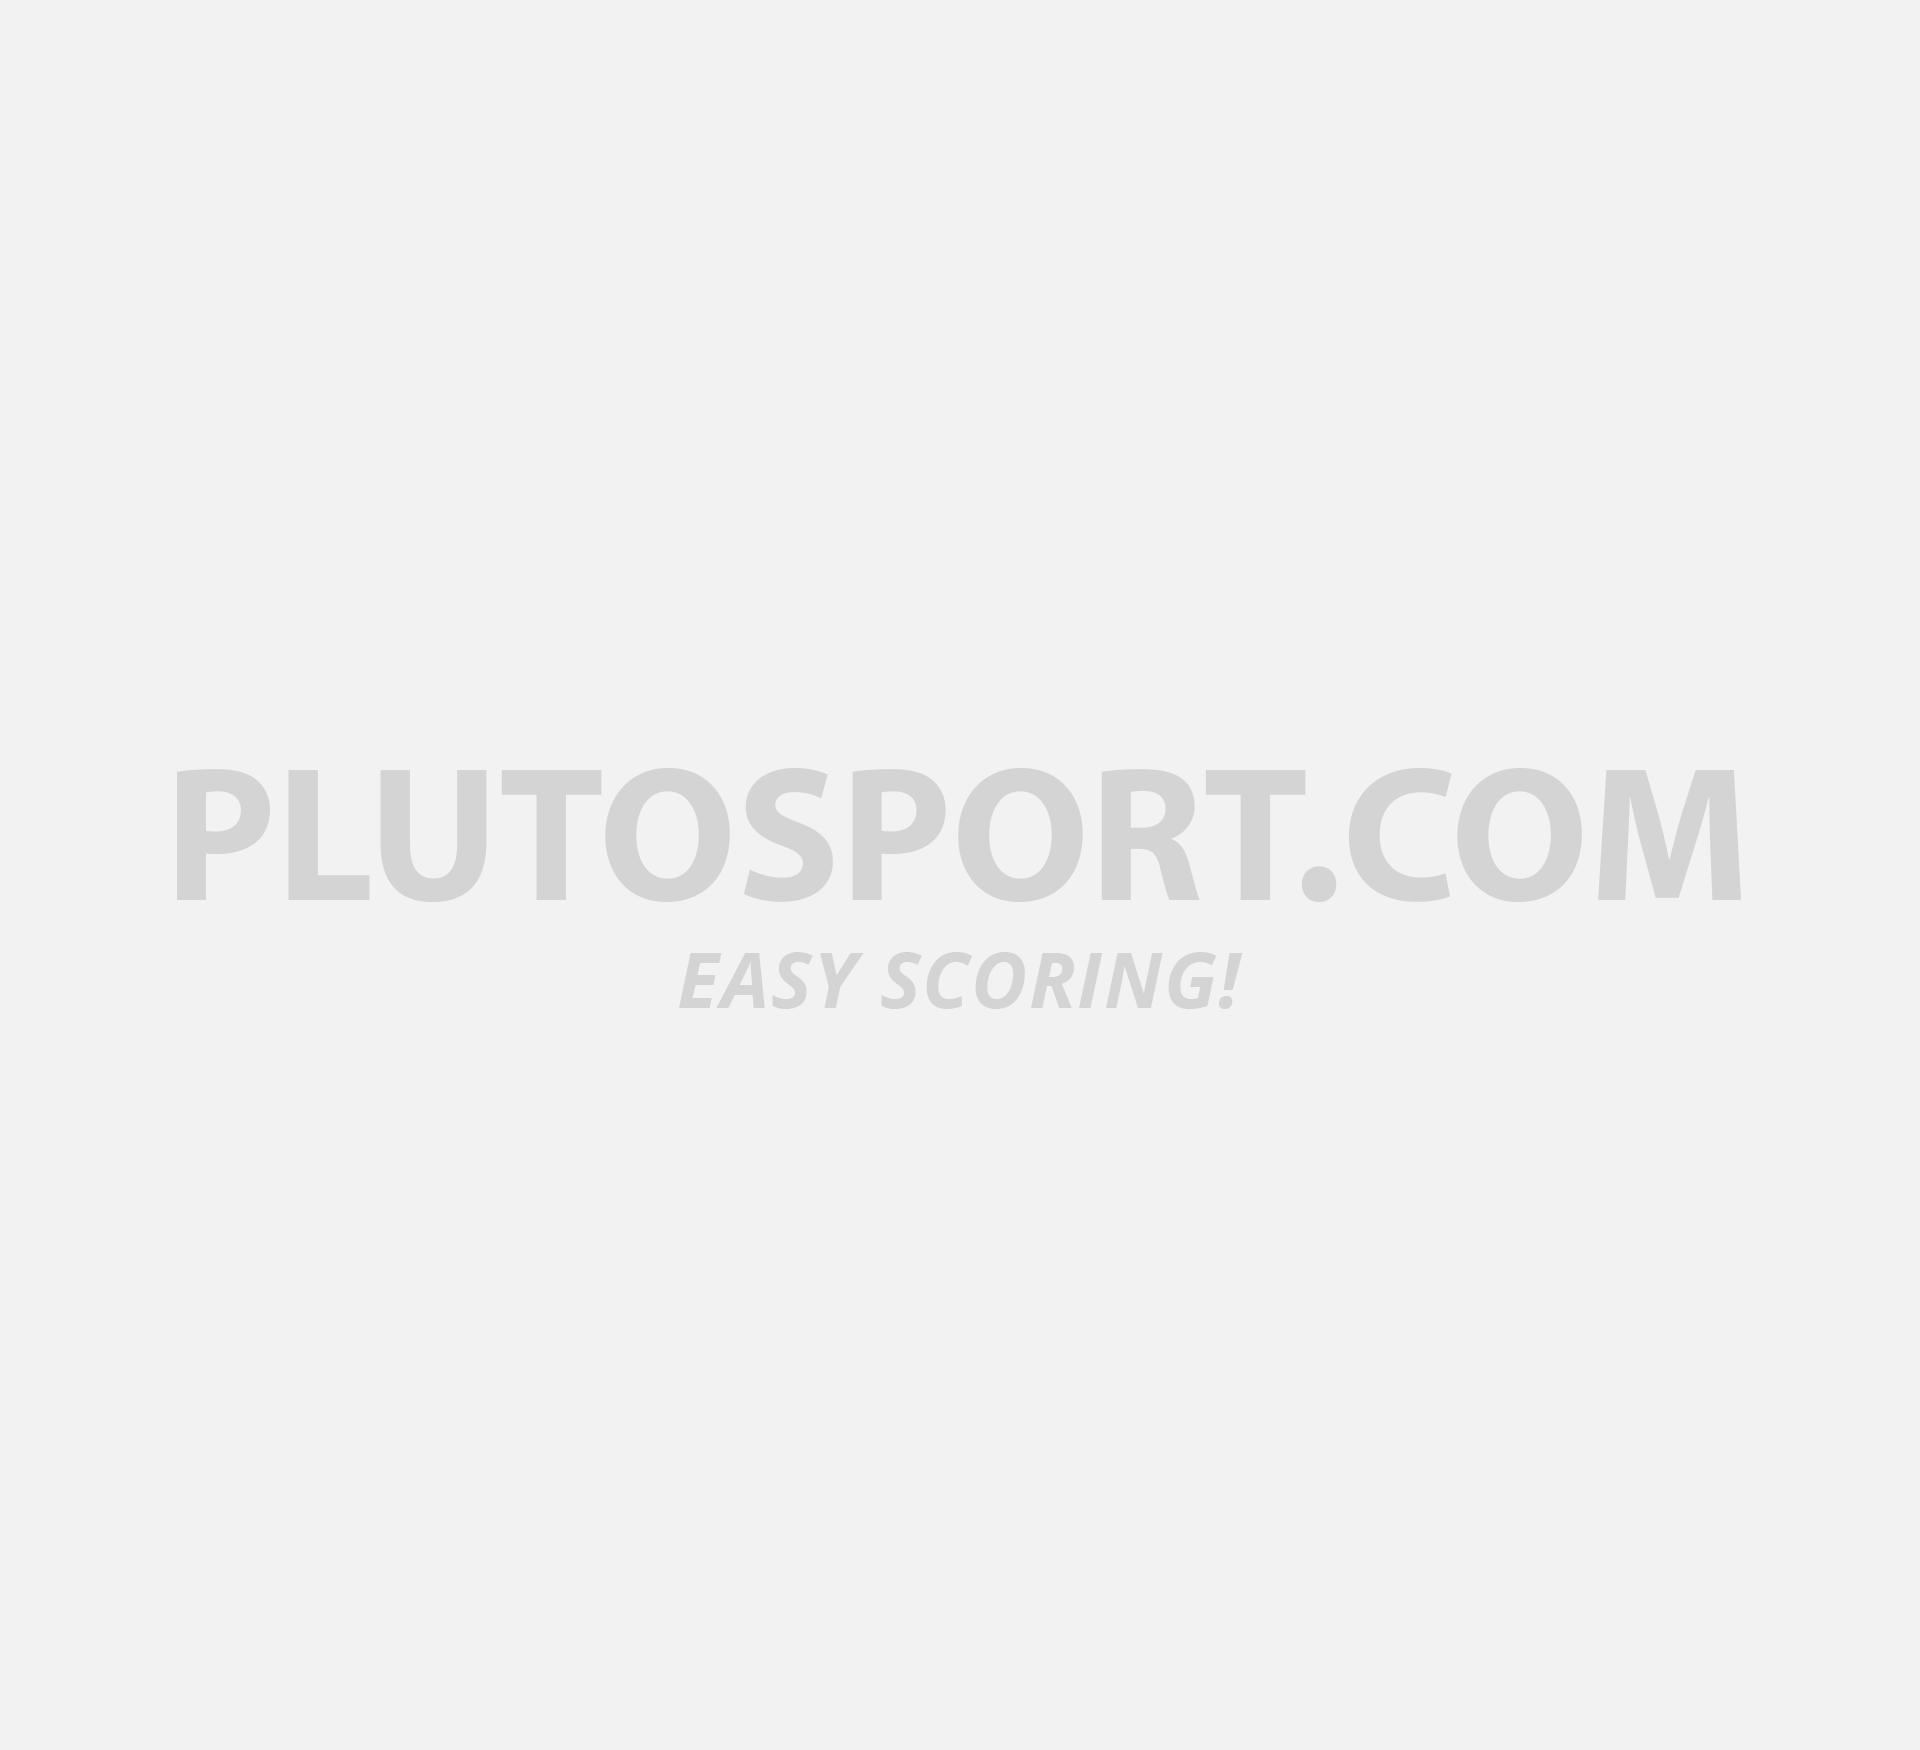 buy online 5ba17 3d0bb Nike Benassi JDI Print - Bath slippers - Slippers - Shoes - Lifestyle -  Sports   Plutosport